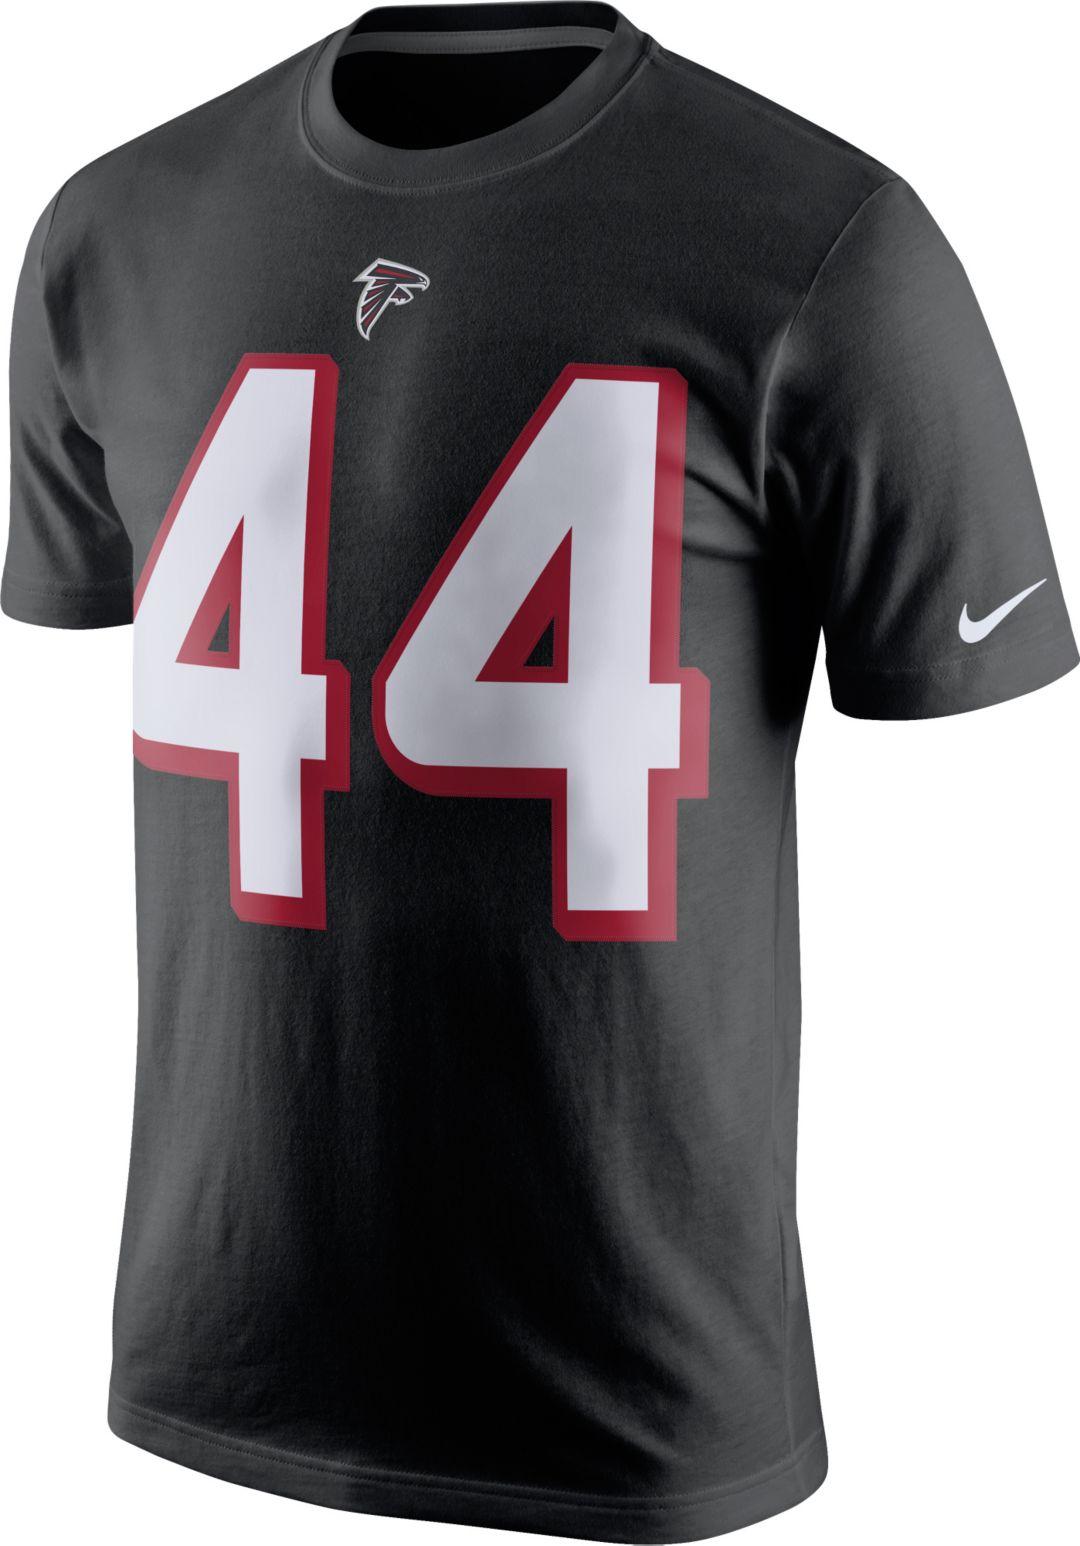 innovative design d90df fcde5 Nike Men's Atlanta Falcons Vic Beasley #44 Pride Black T-Shirt